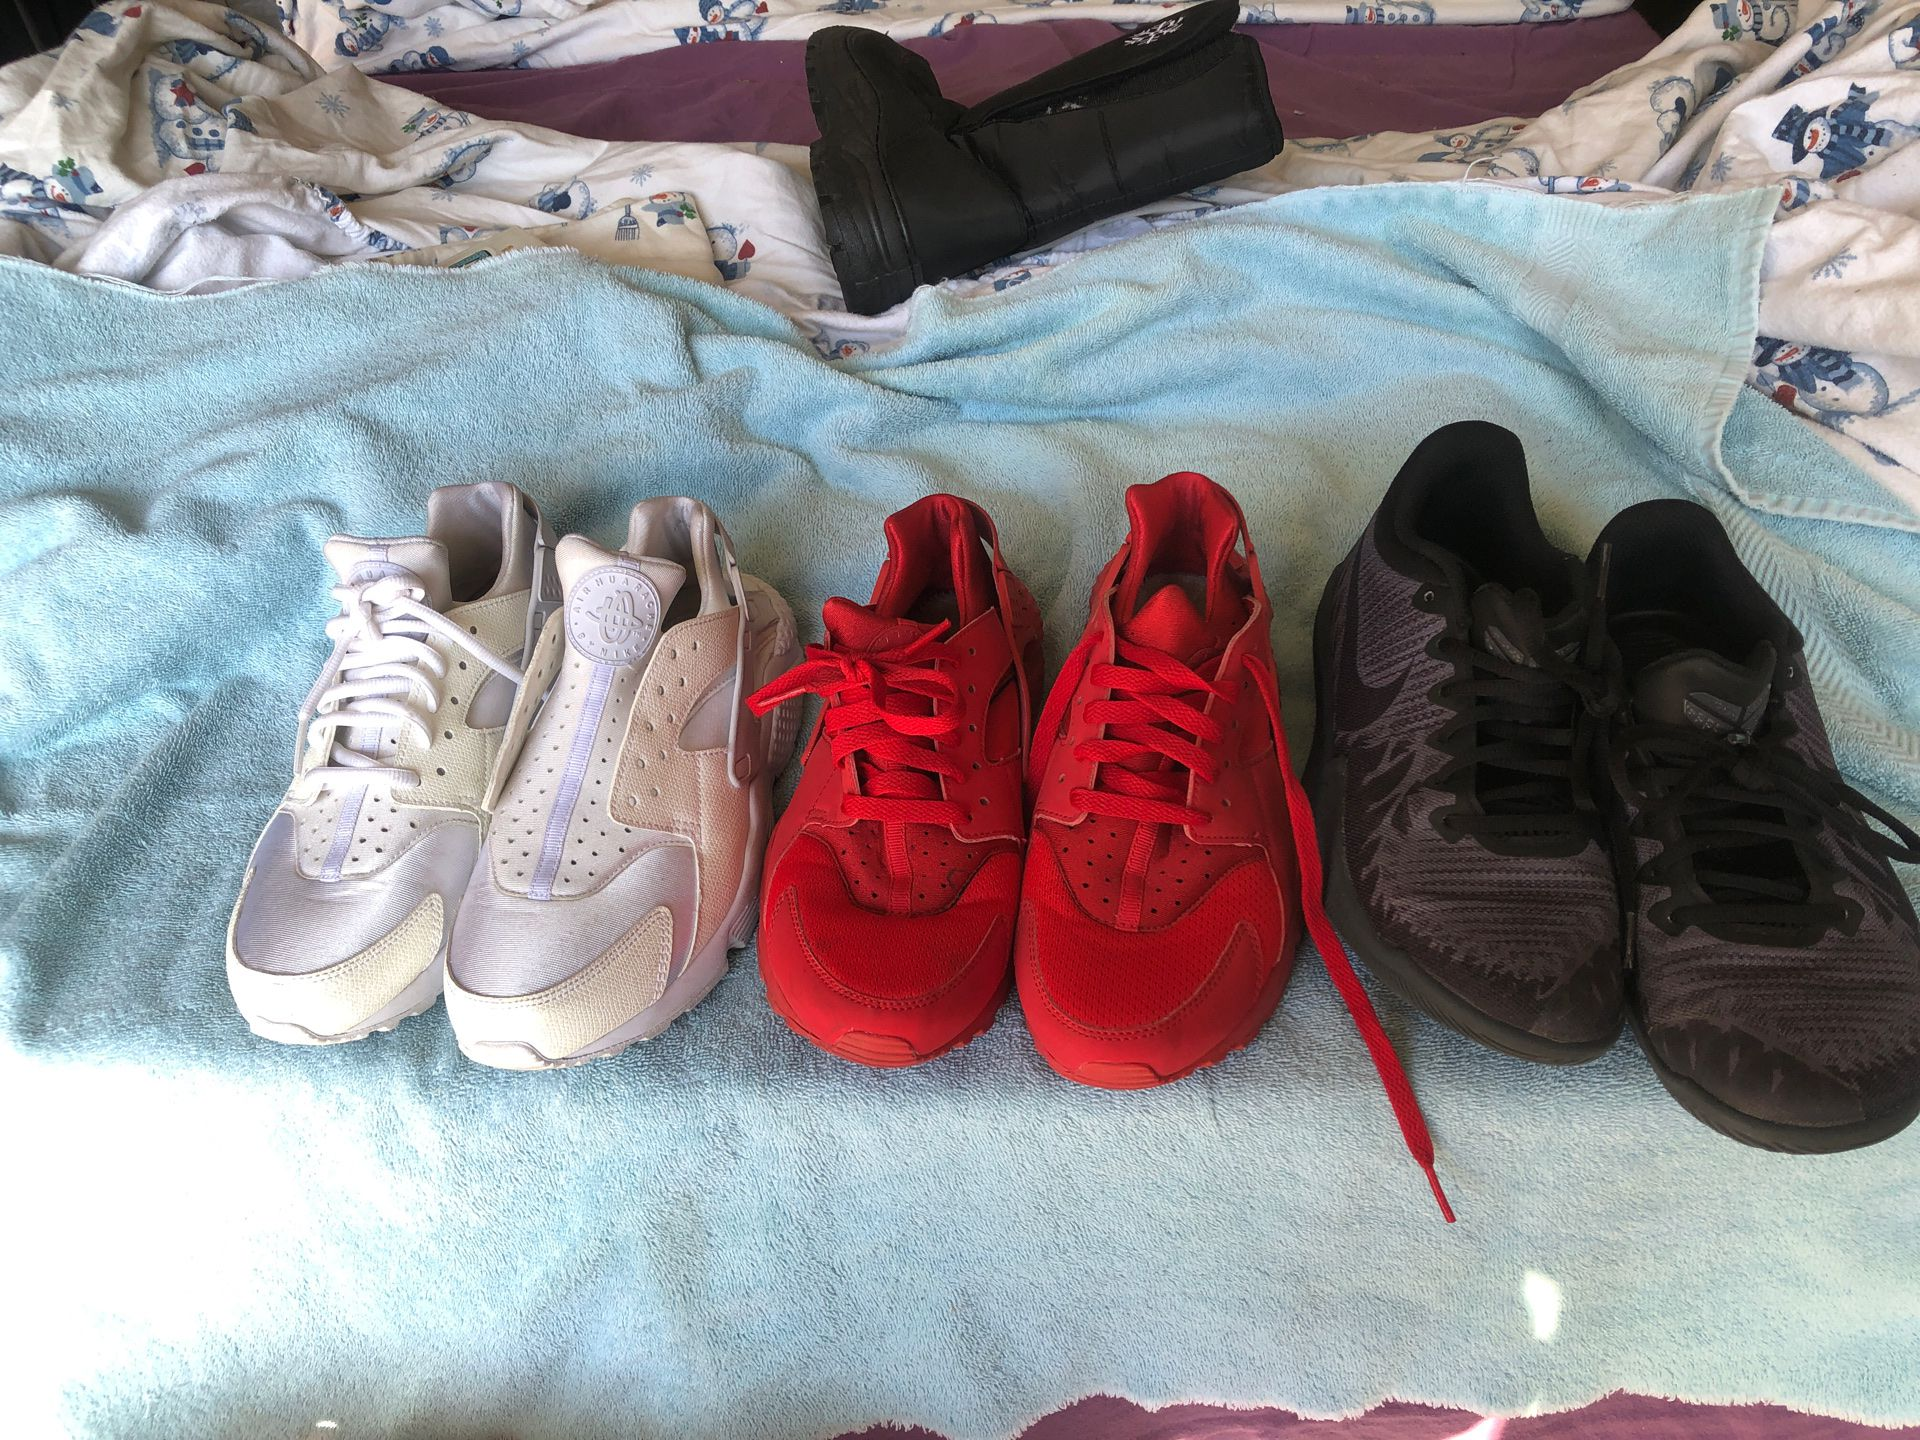 Ladies Nike tennis shoes